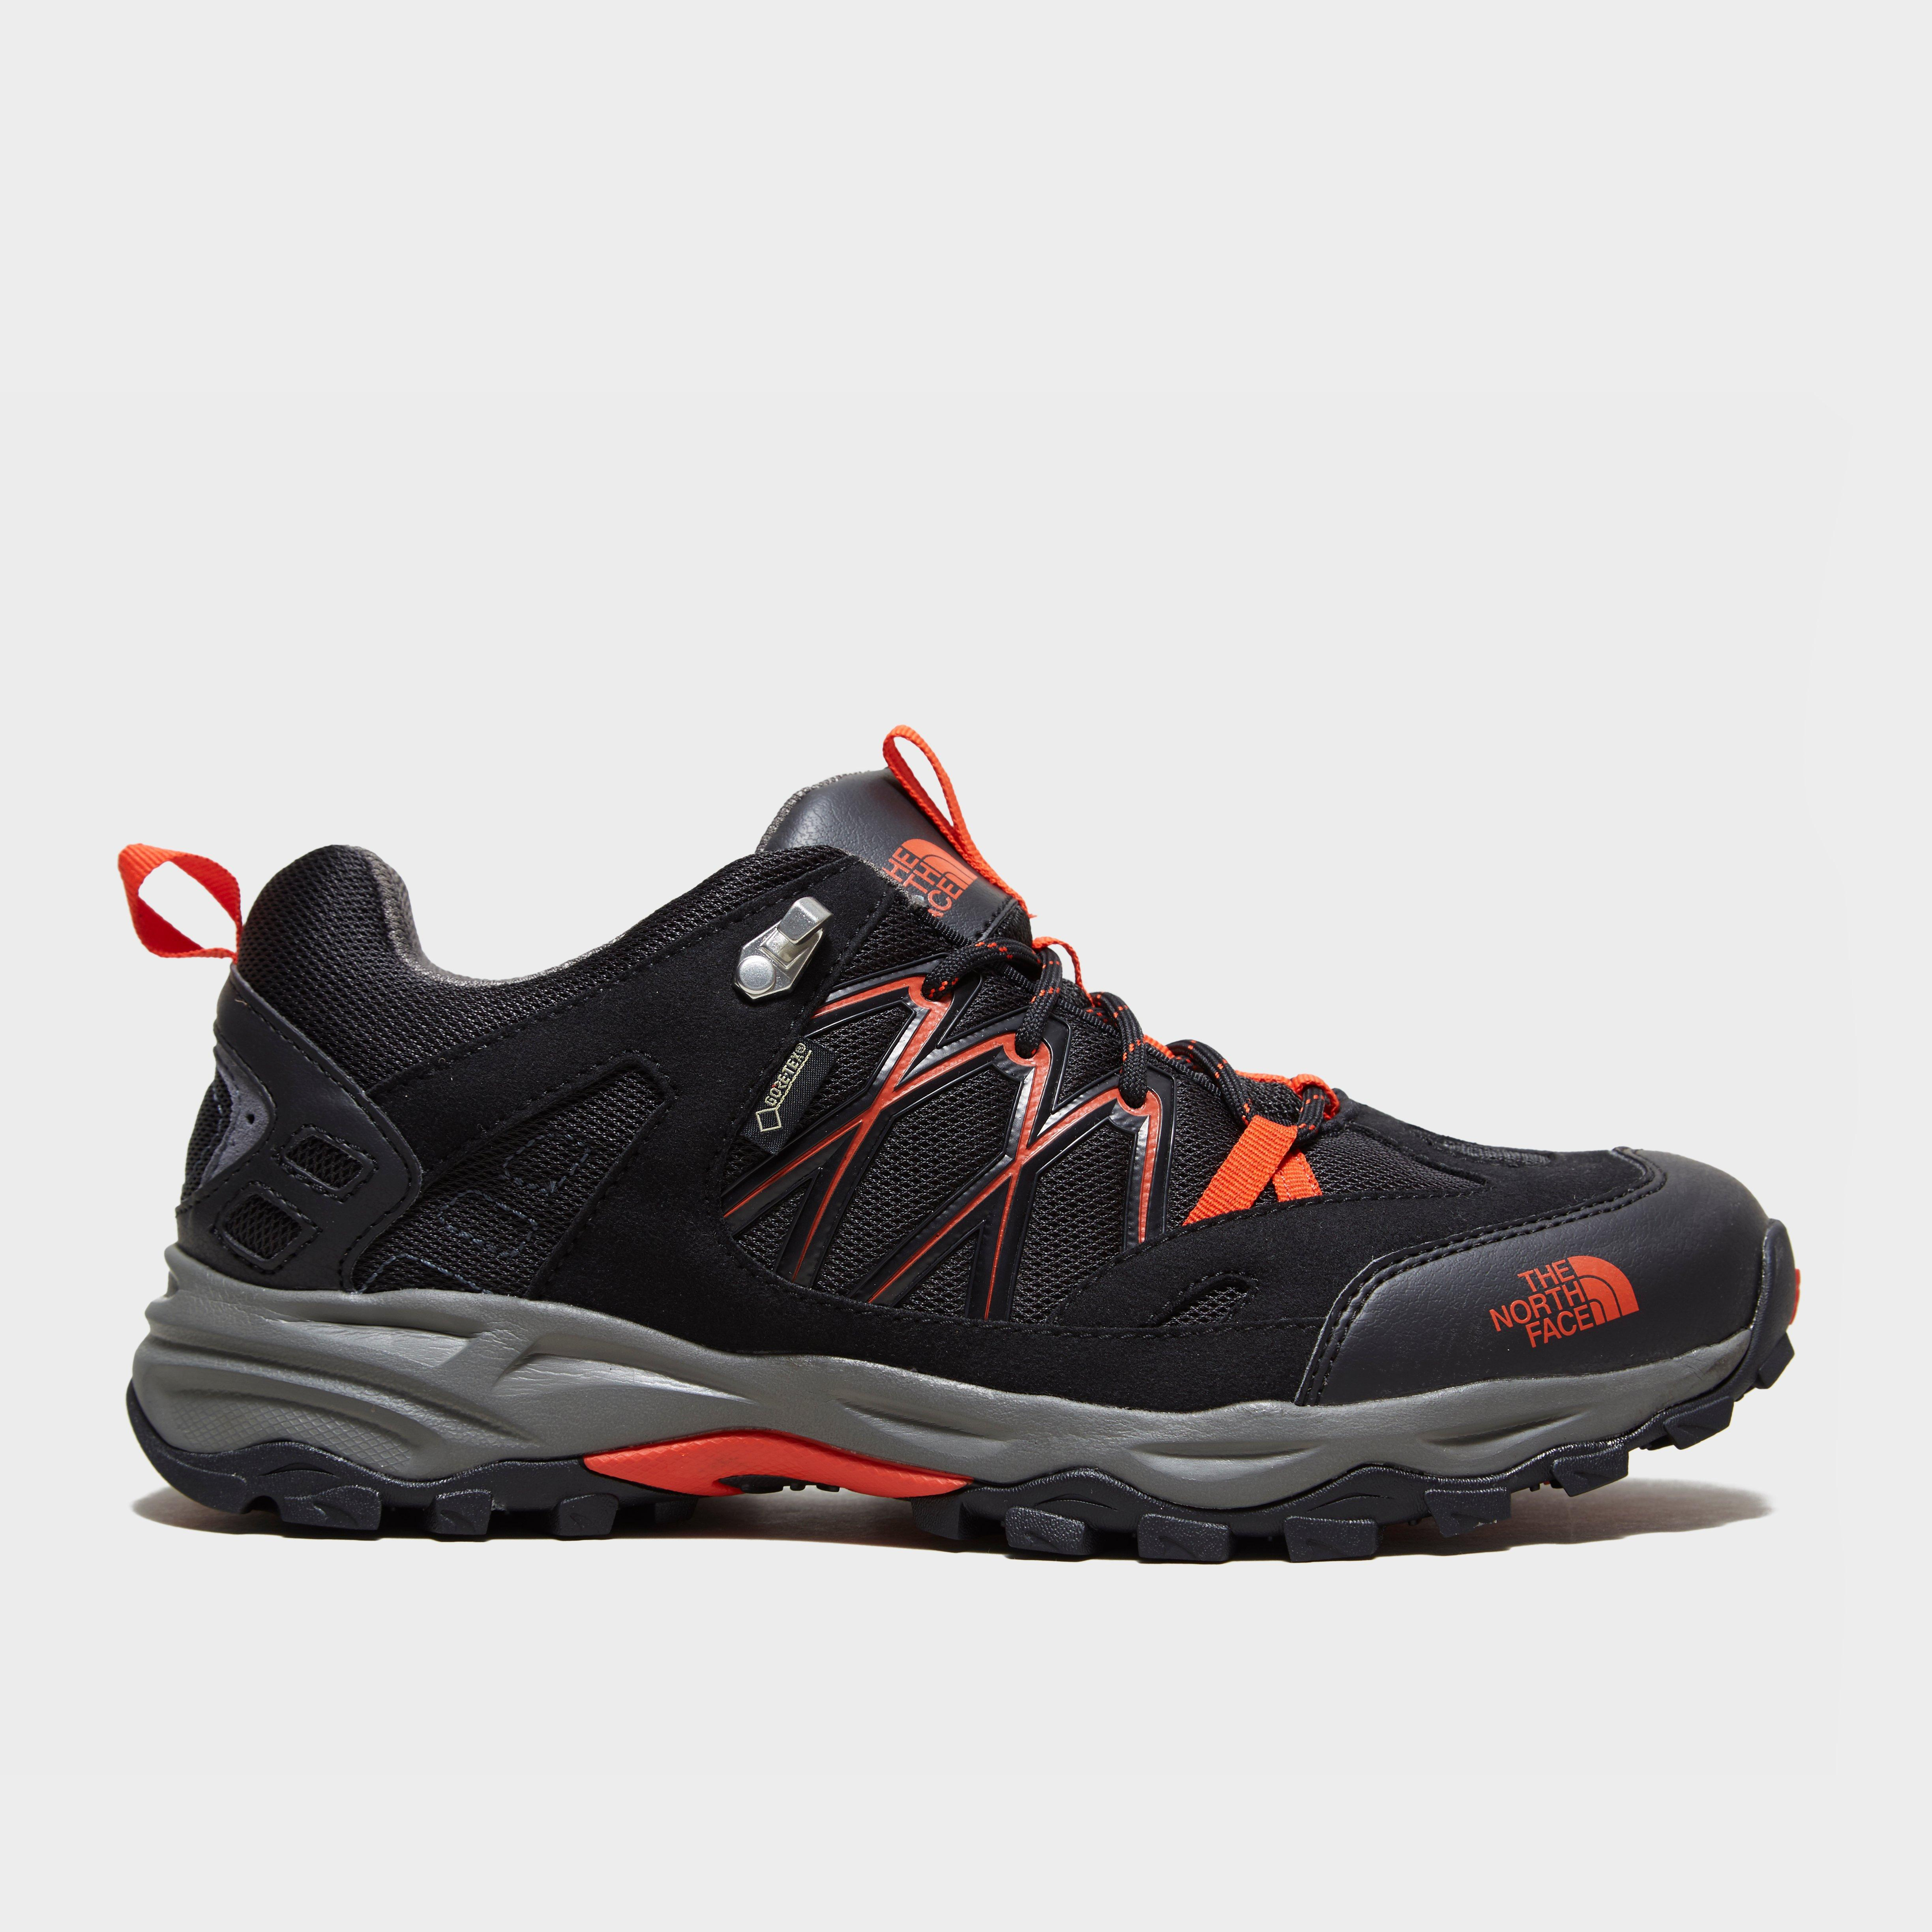 gore tex shoes menu0027s terra gore-tex® hiking shoe sjjzguf